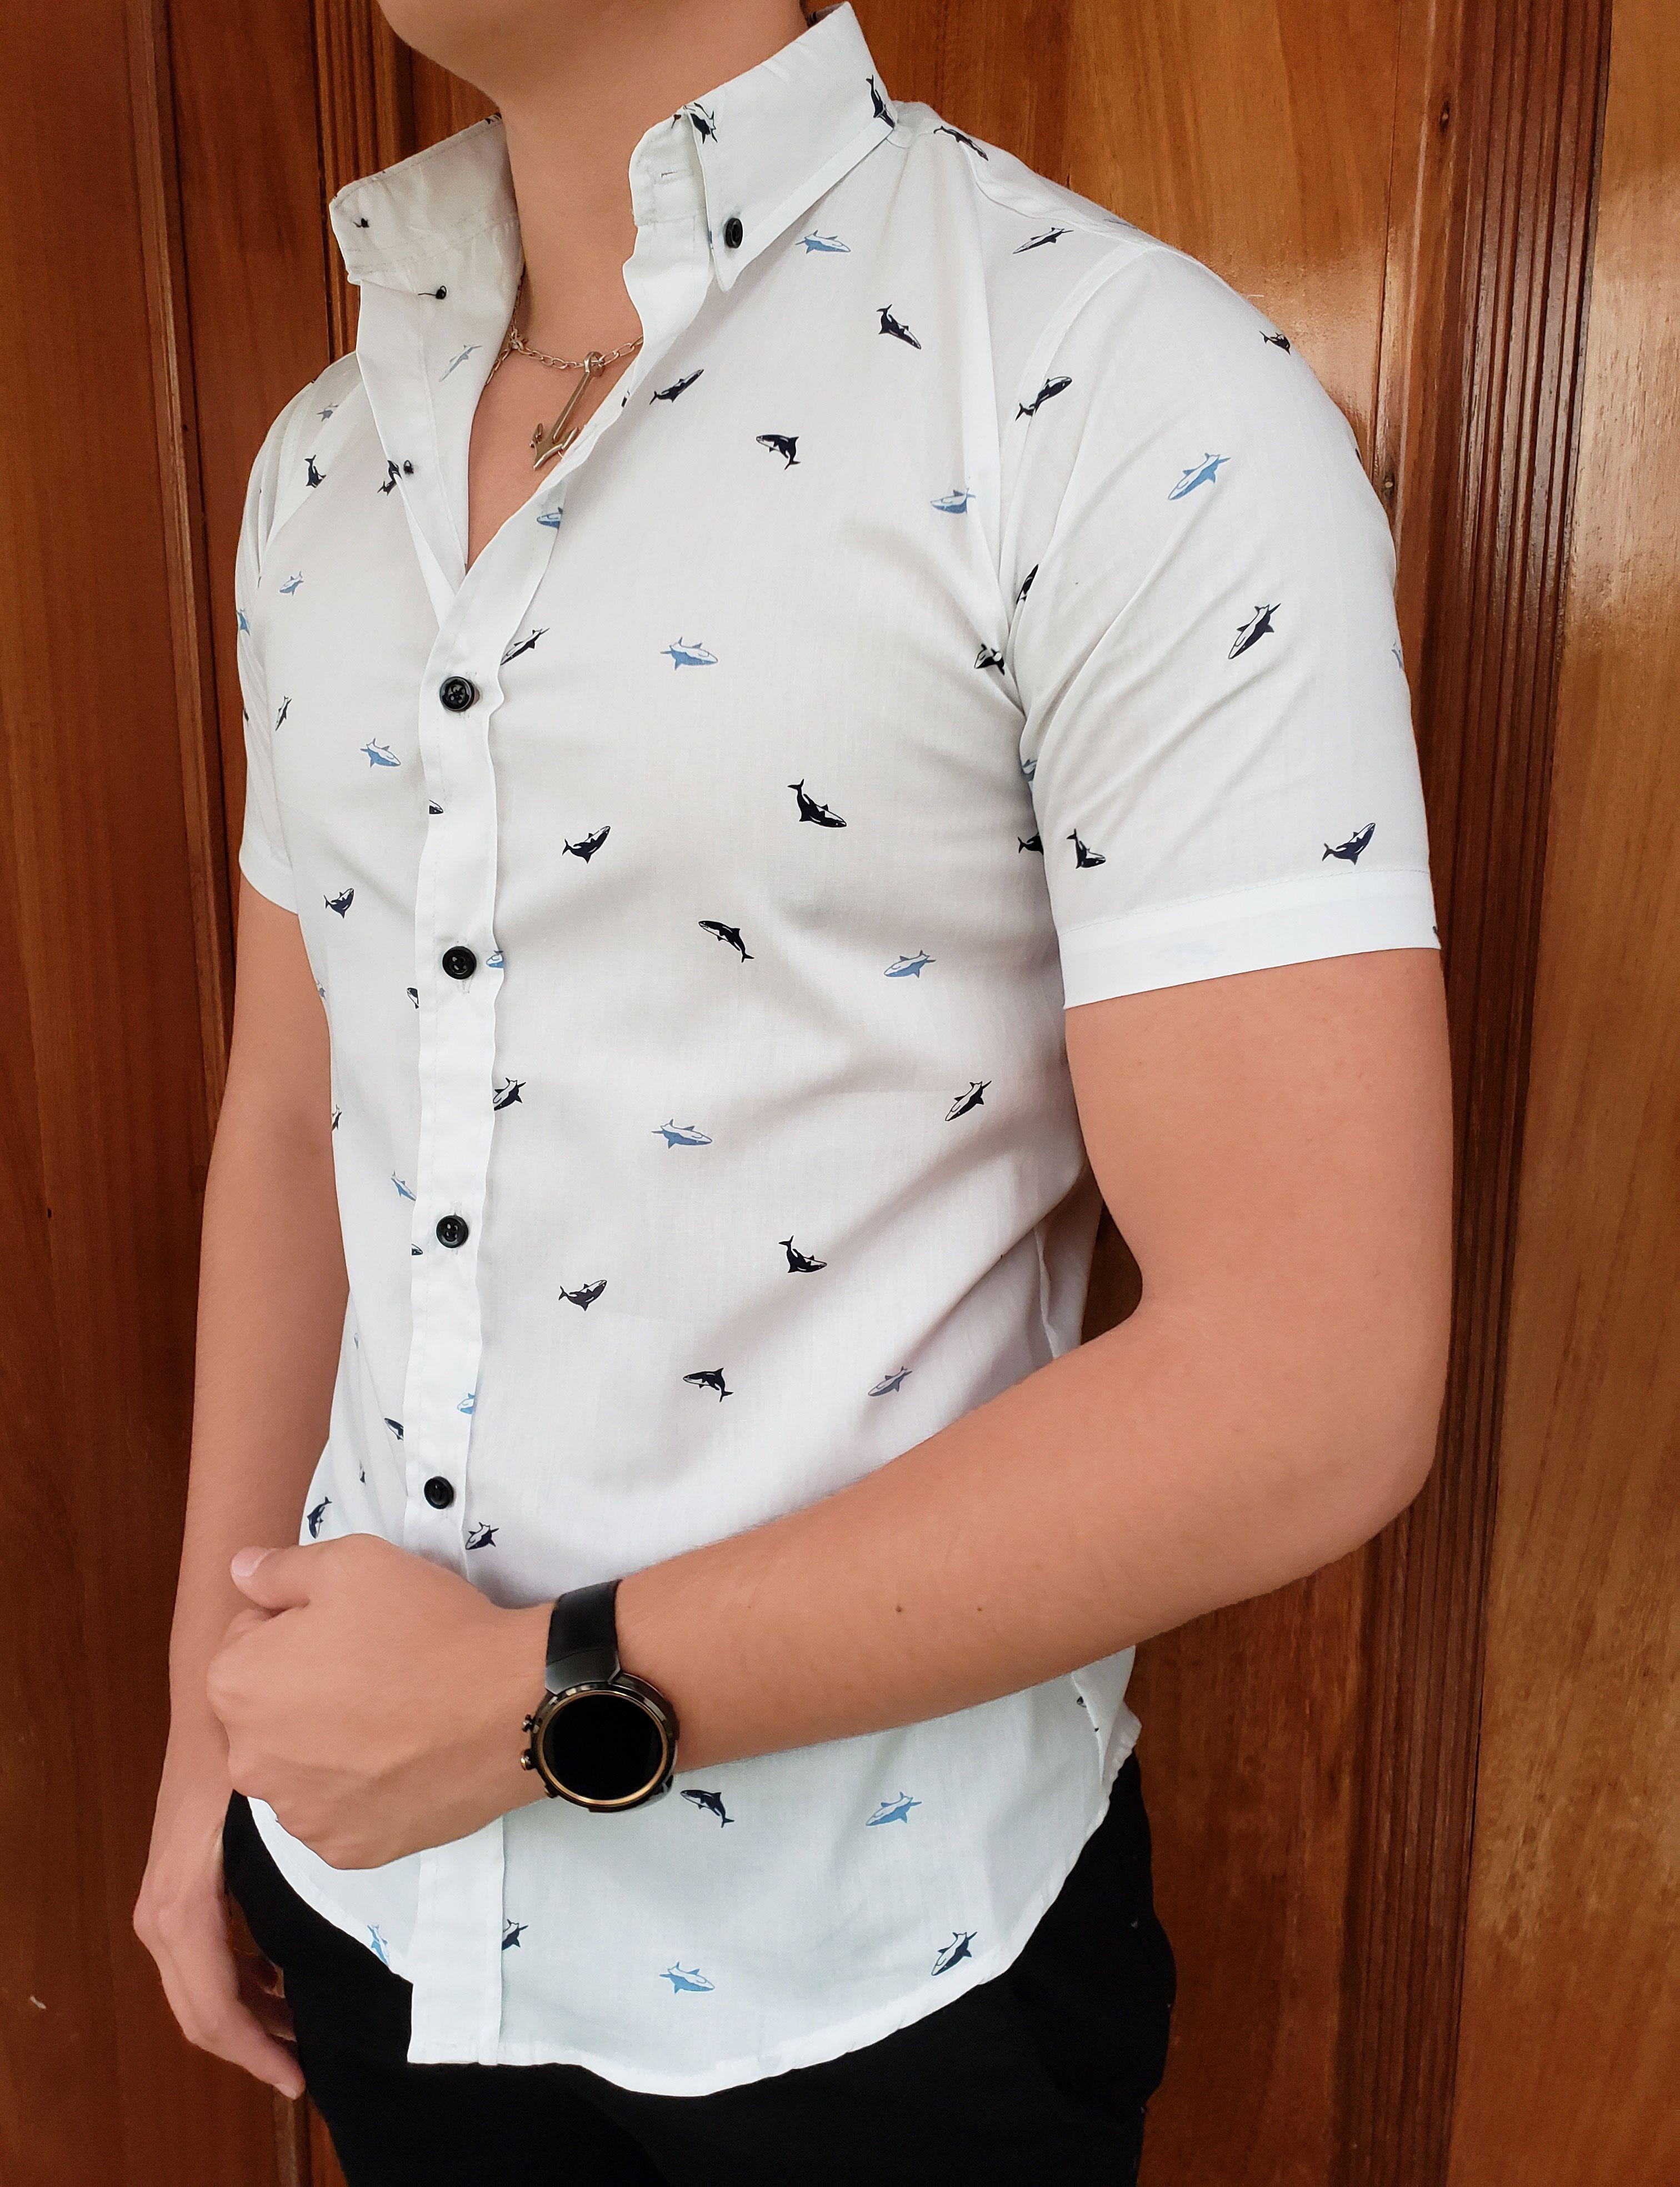 thewhiteshirt | Moda hombre, Camisas blancas hombre, Ropa de